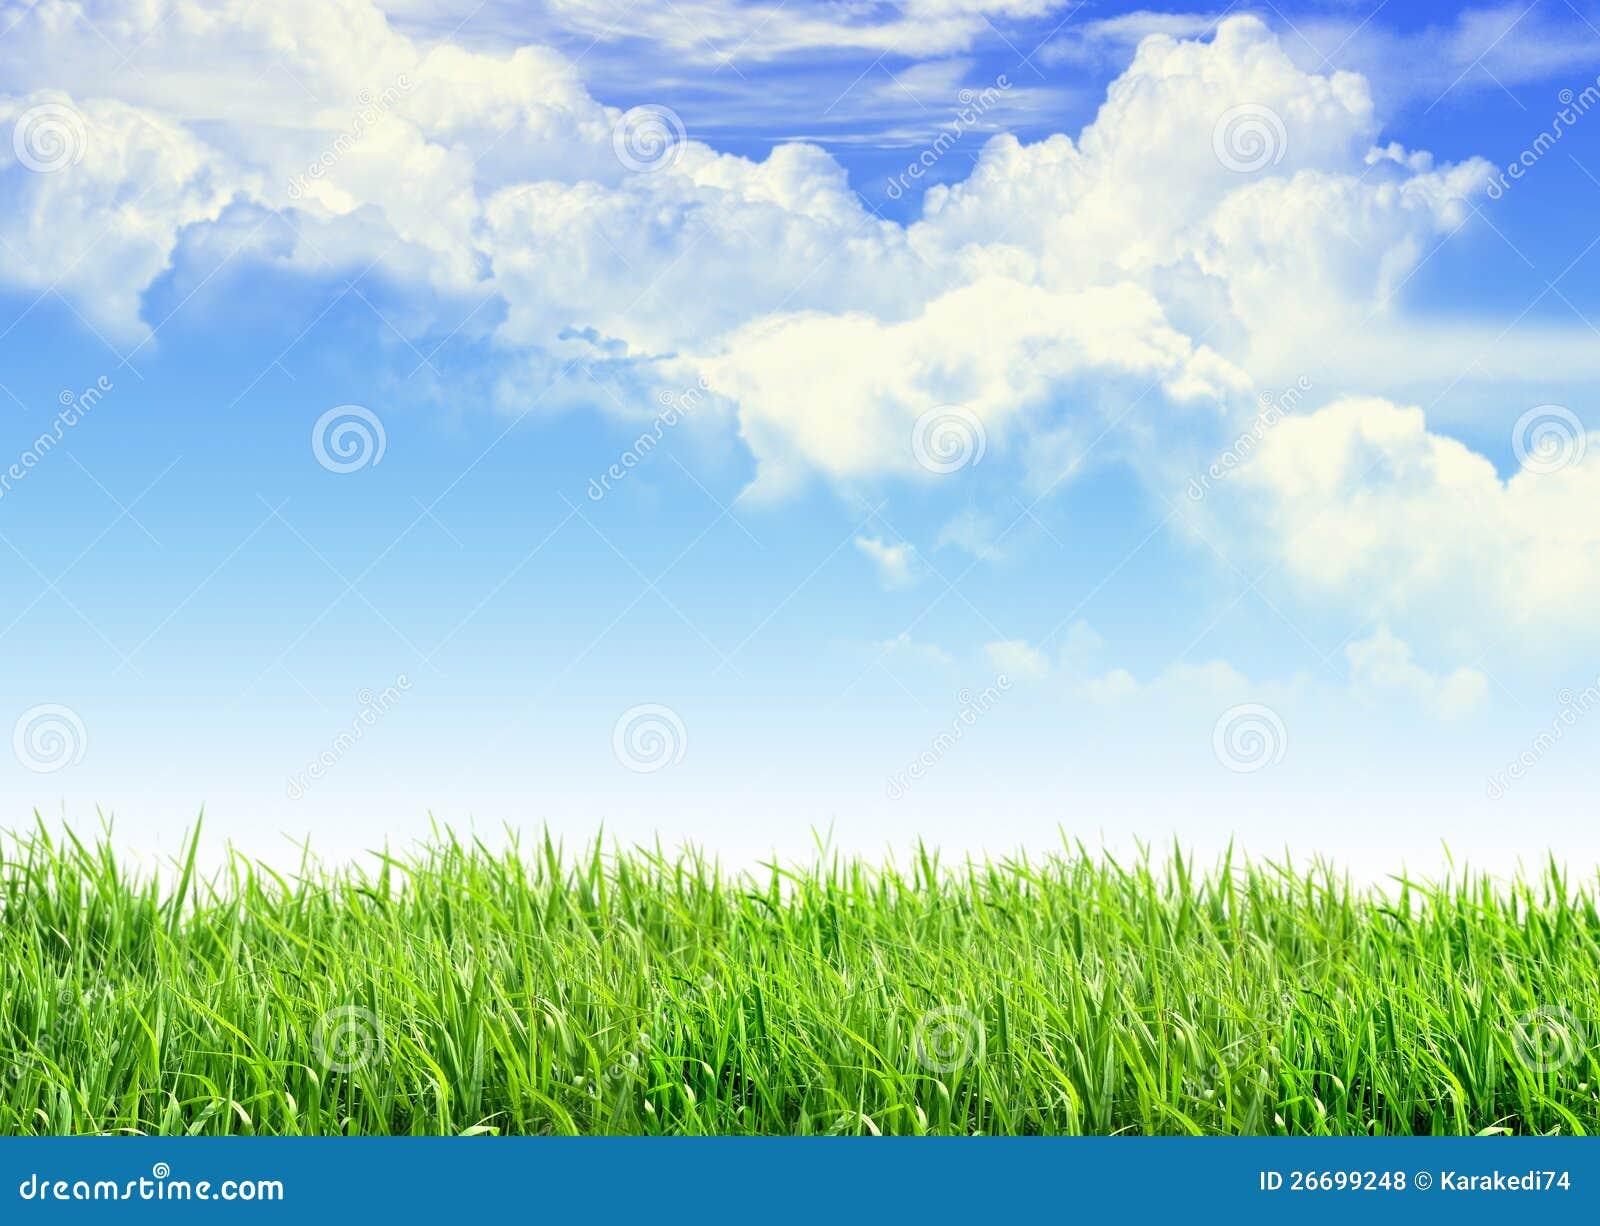 Grass Stock Photos Download 3086605 Images